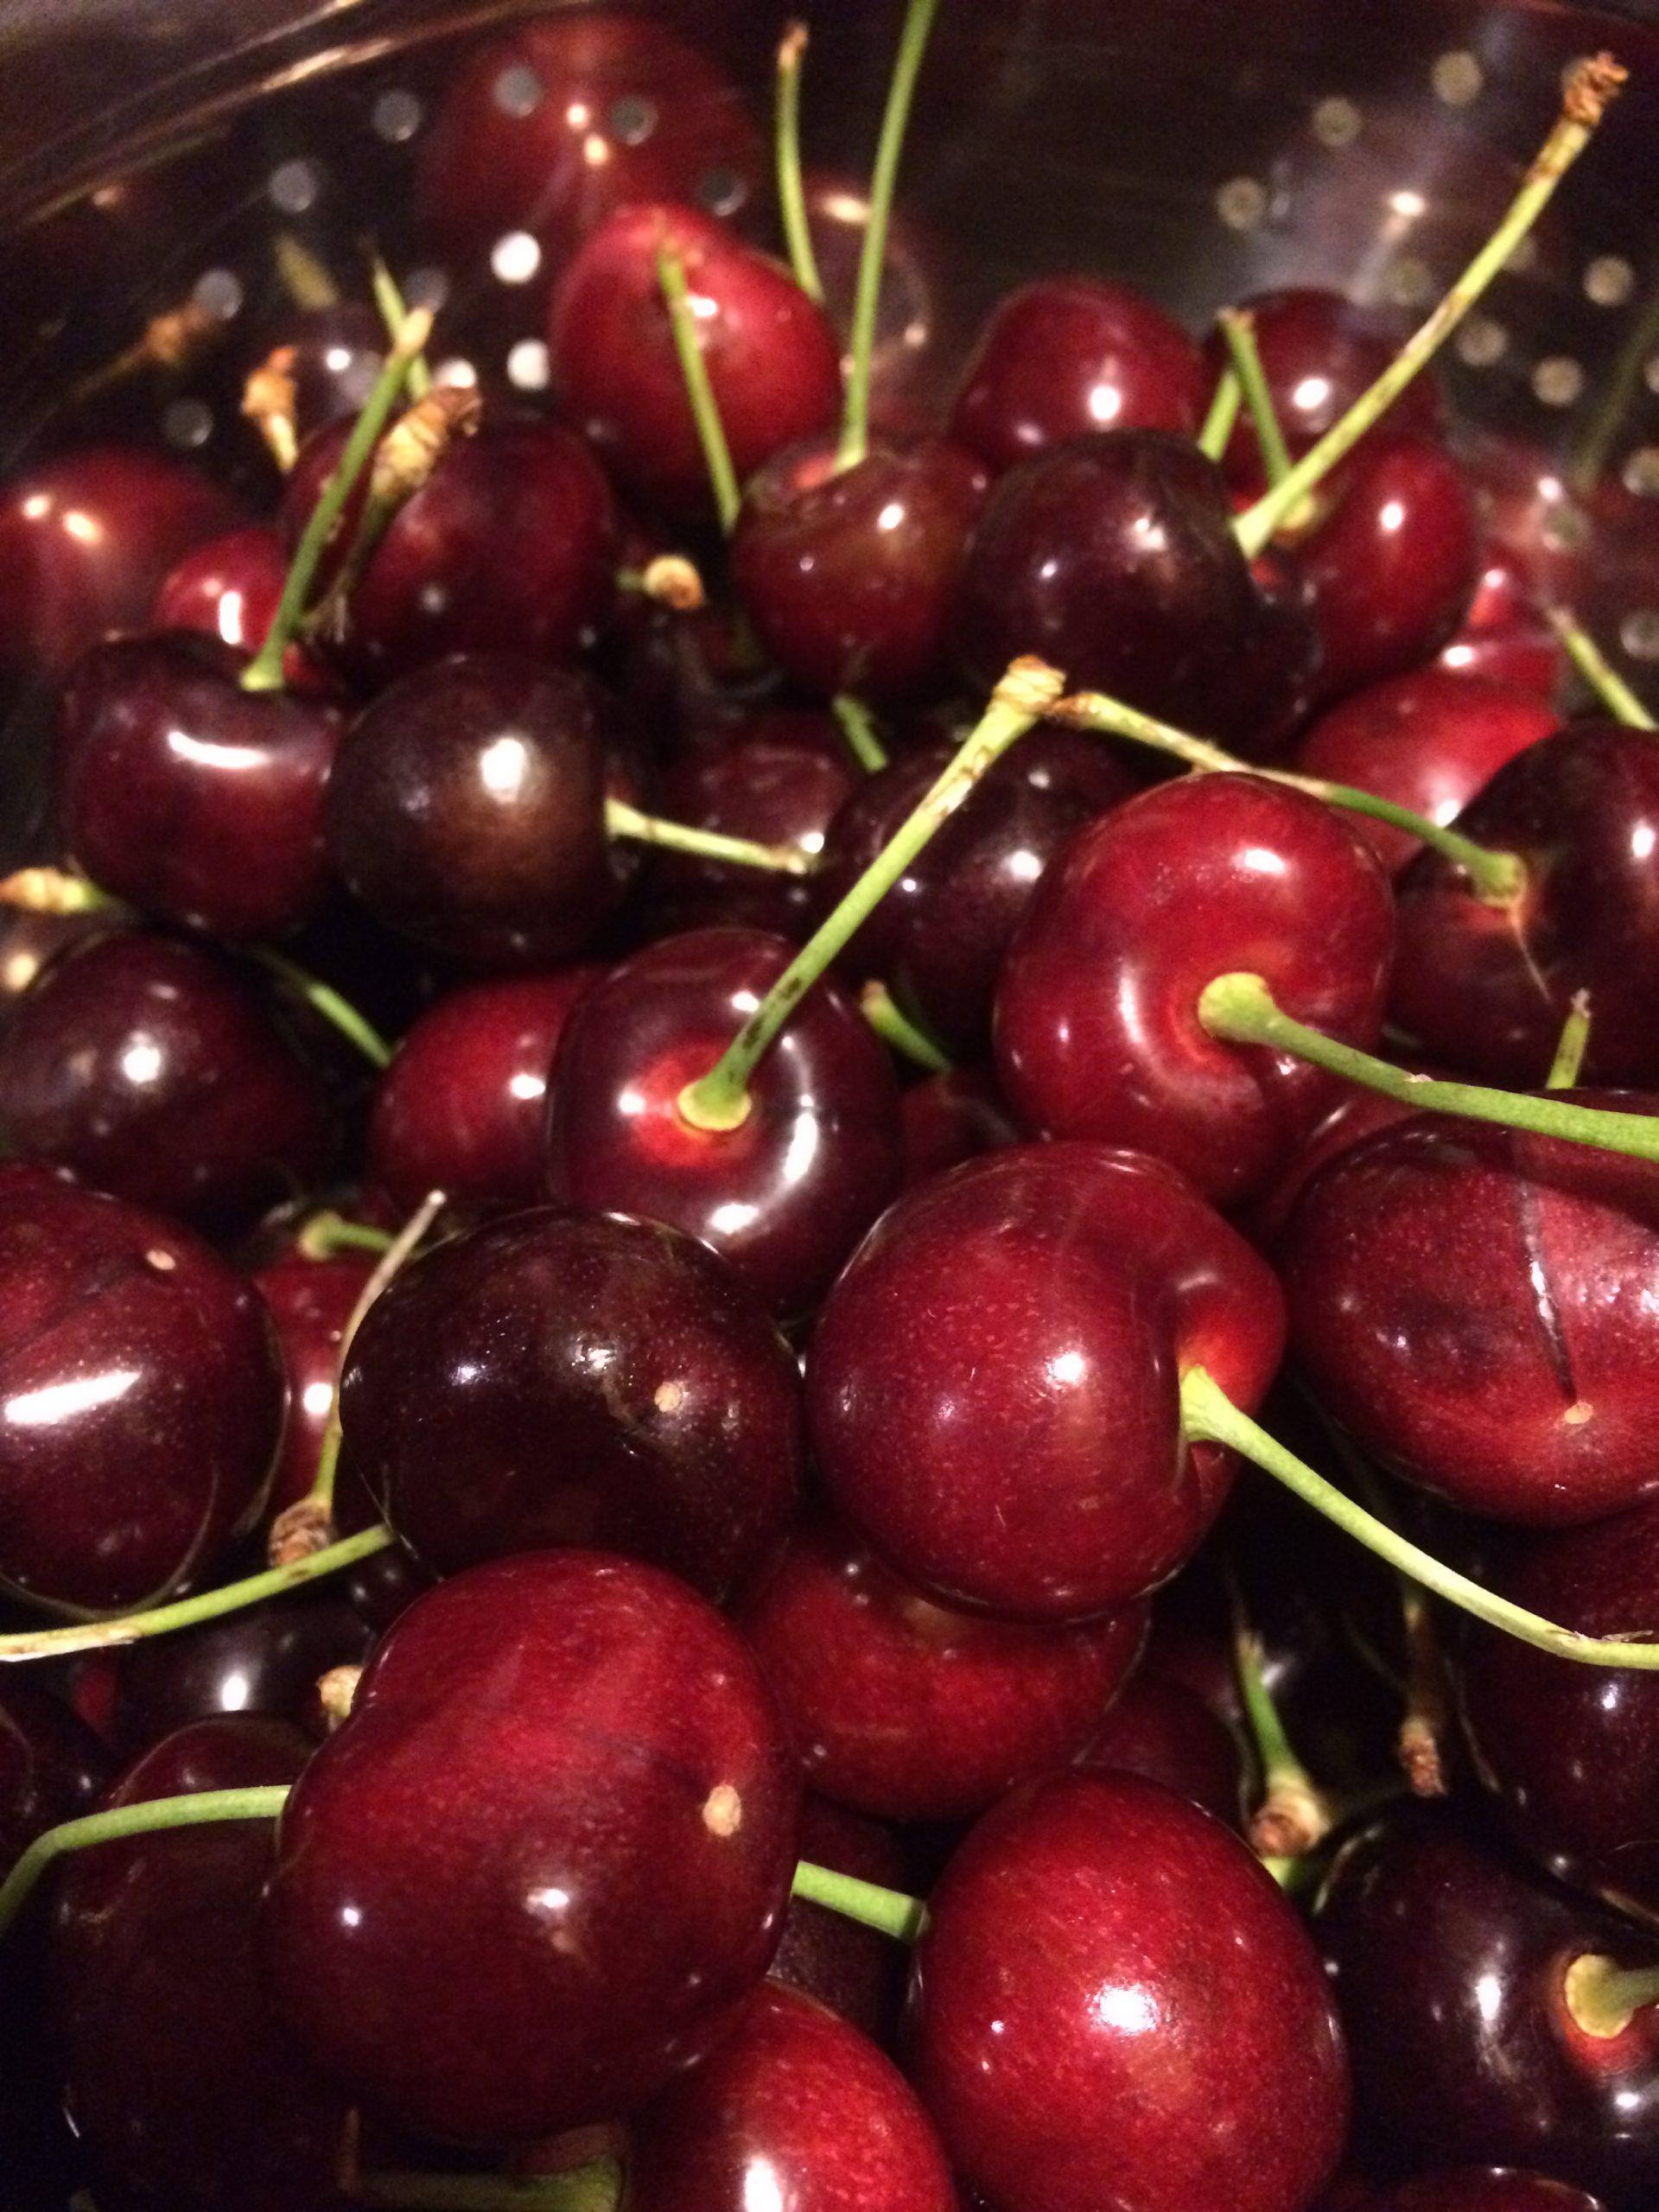 washington cherries canbassador - The Canning Diva